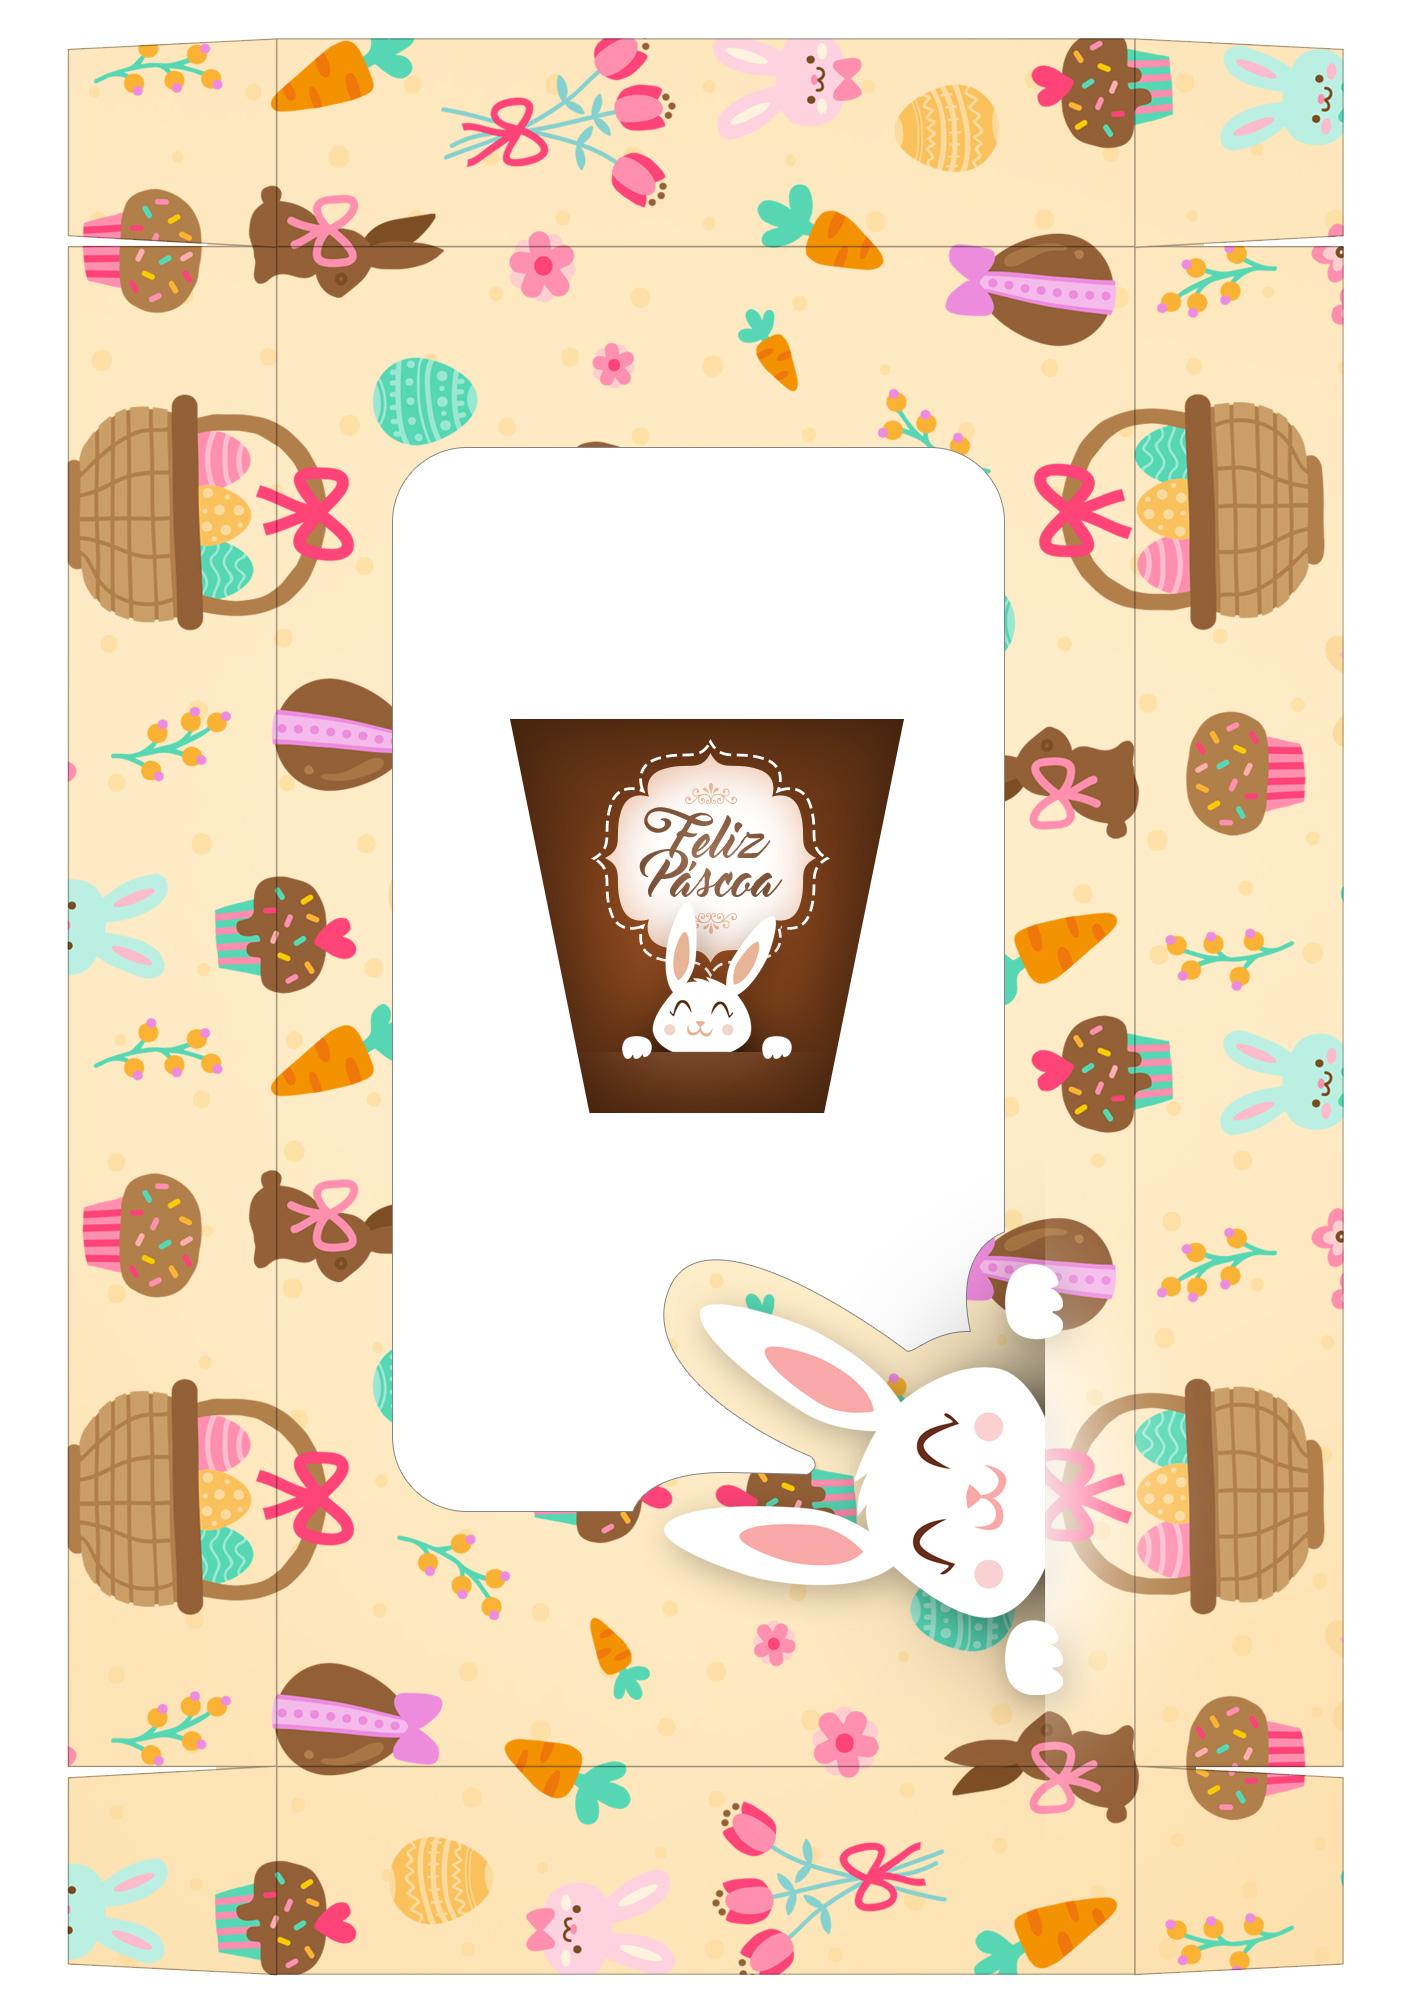 Caixa Kit Confeiteiro para Páscoa 14 - parte de meio